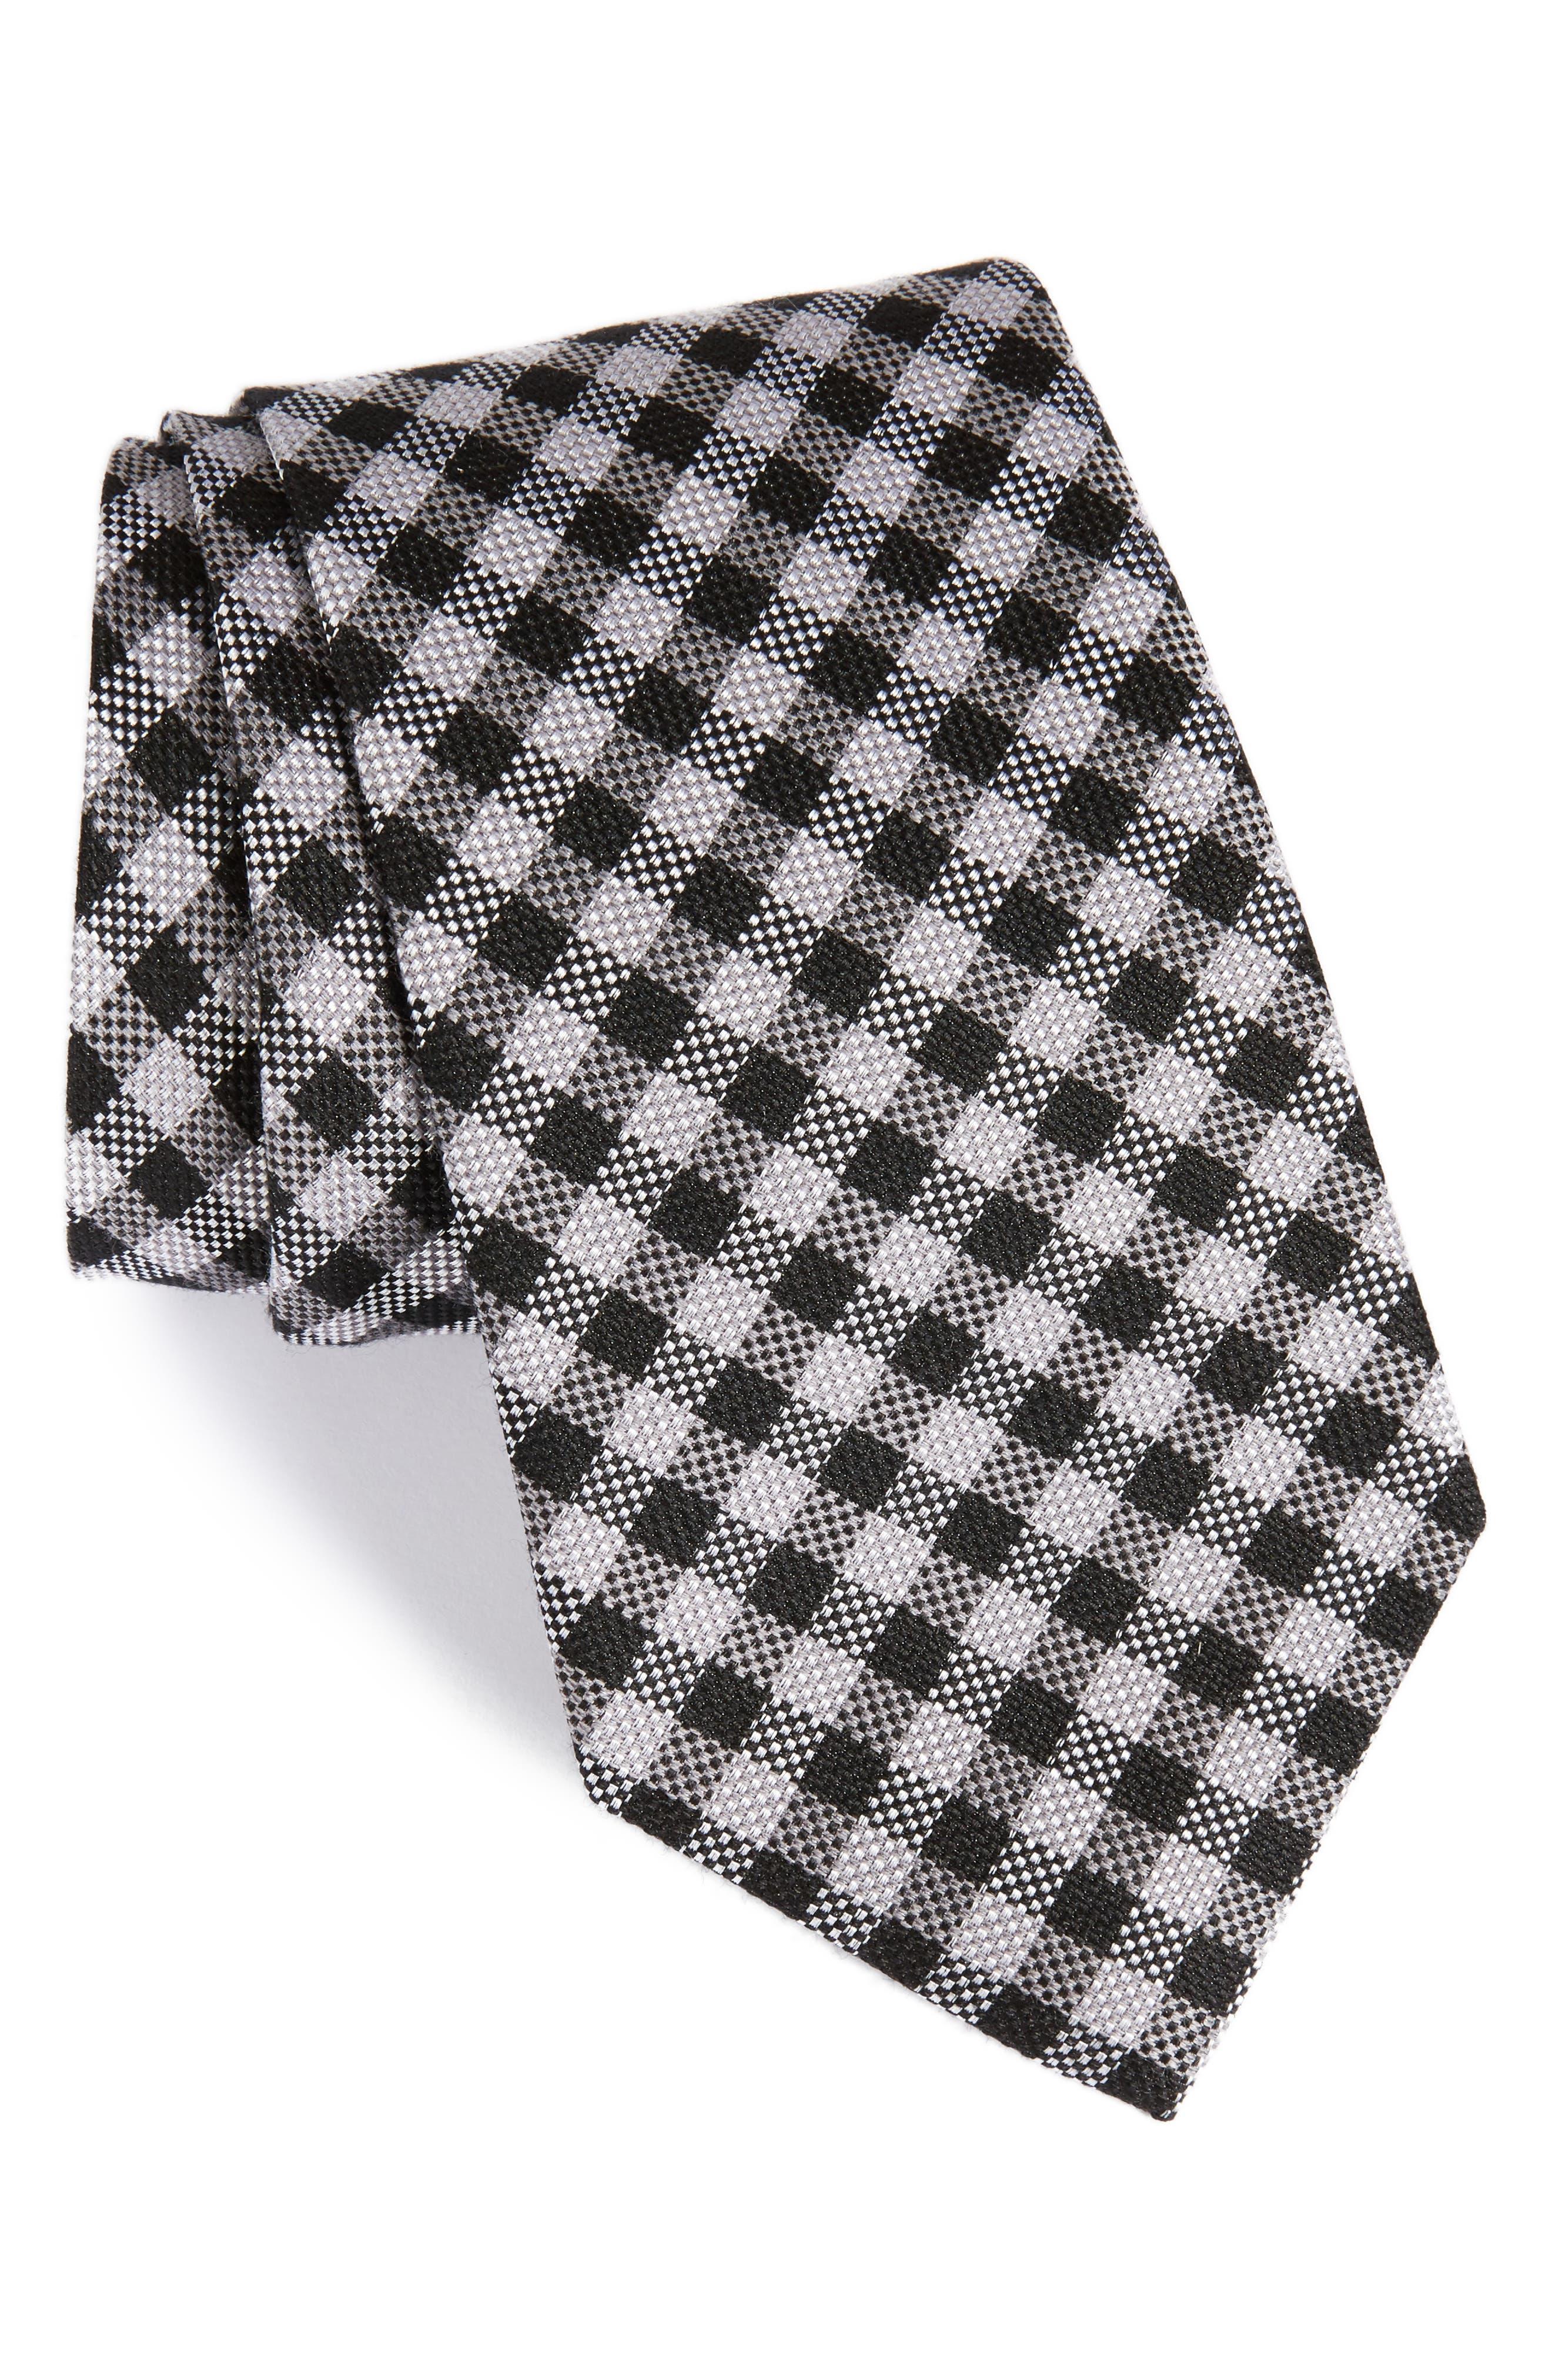 Main Image - Nordstrom Men's Shop Check Silk & Wool Tie (X-Long)